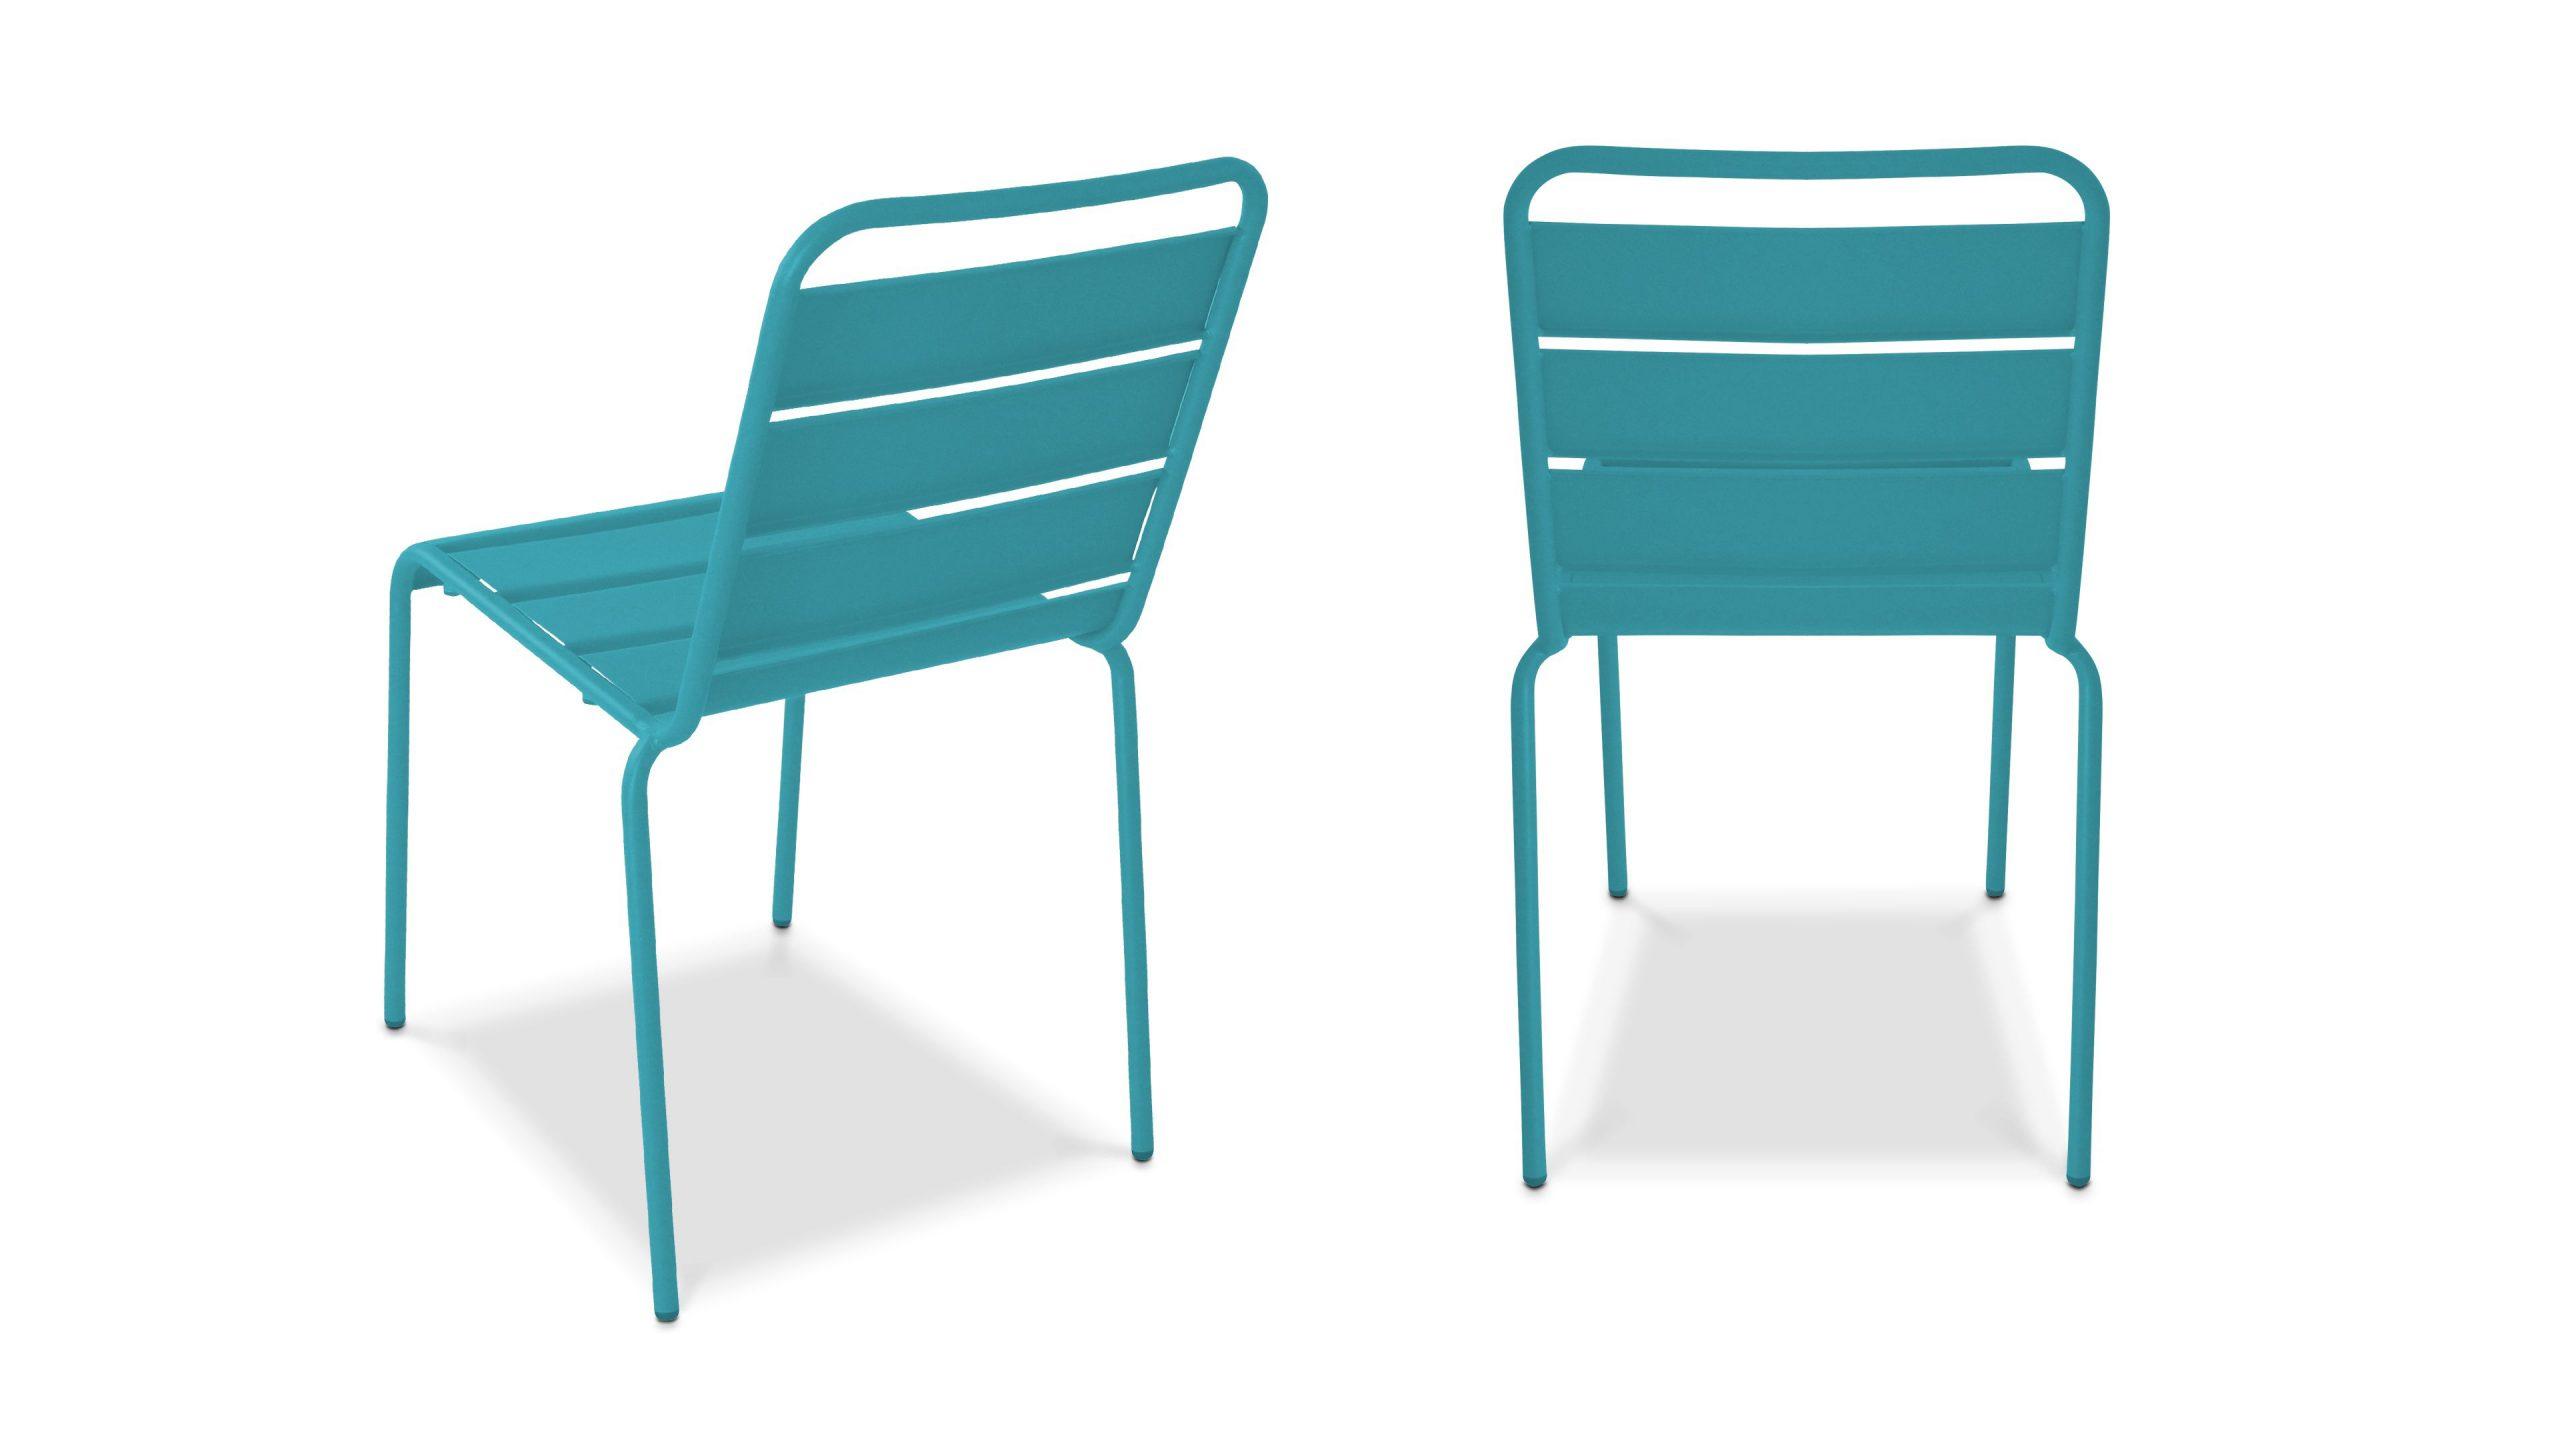 Chaise De Jardin En Métal | Oviala serapportantà Chaise De Jardin Bleu